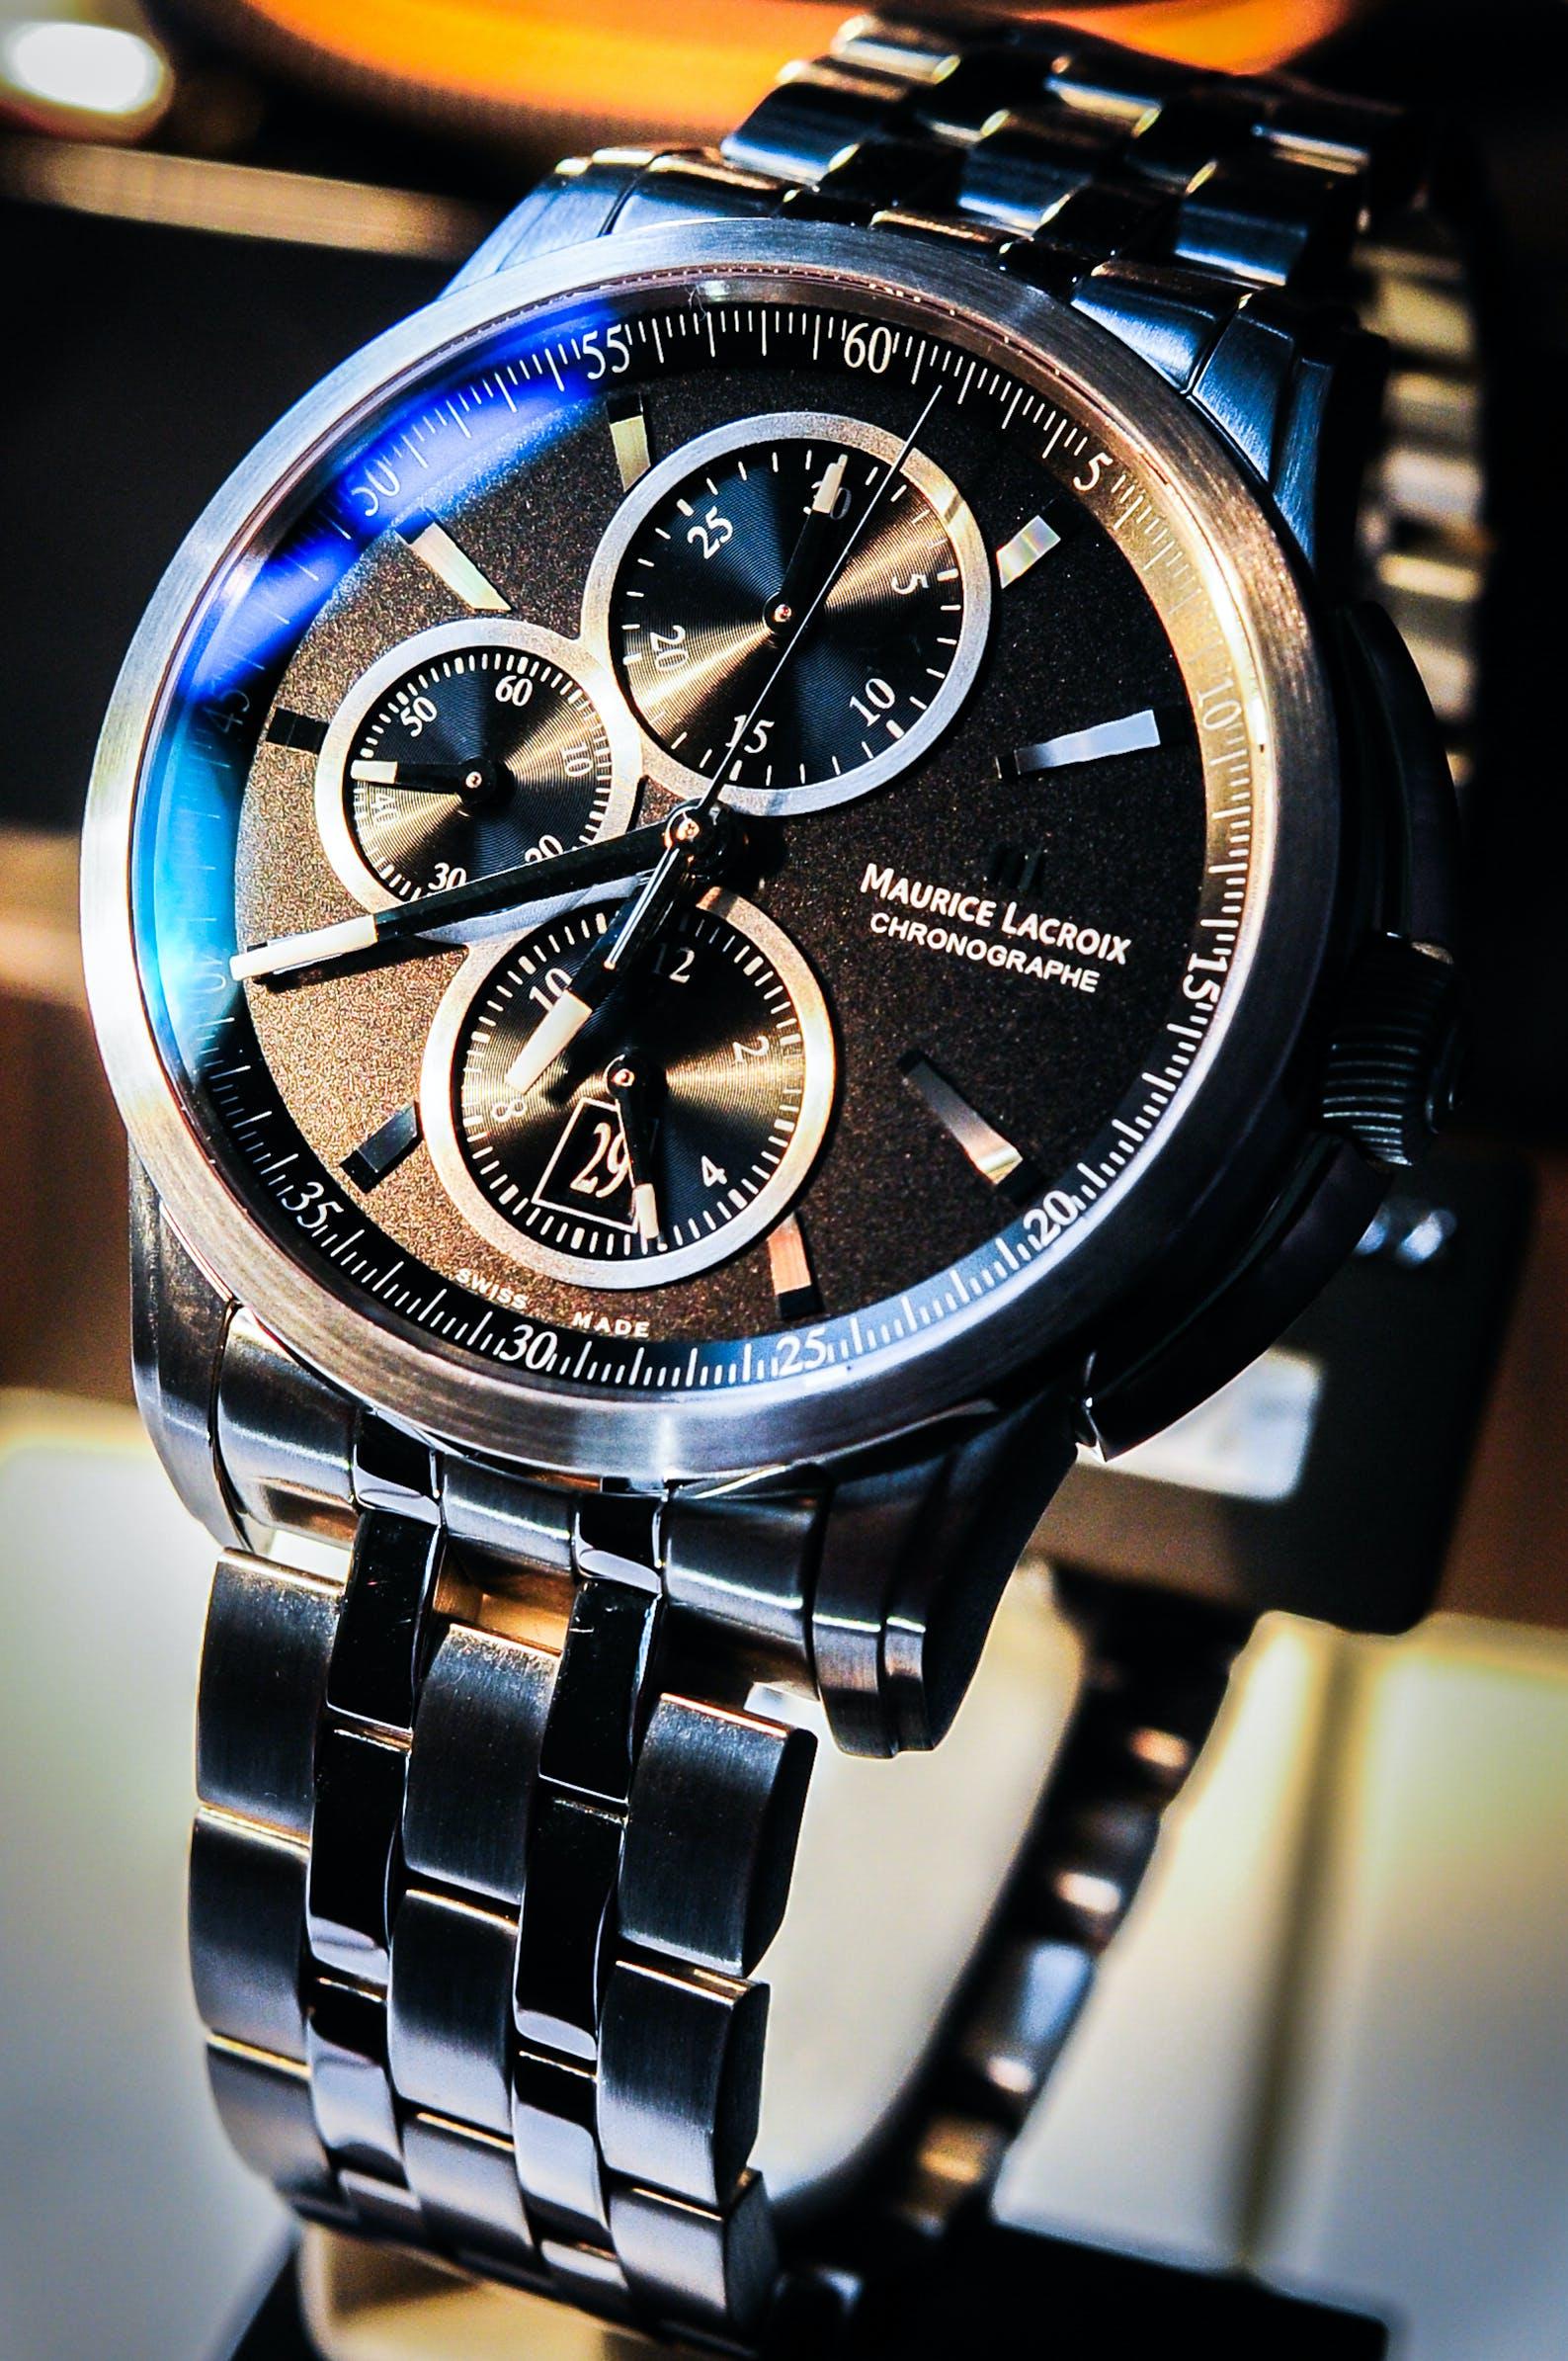 Free stock photo of wristwatch, time, watch, accessory